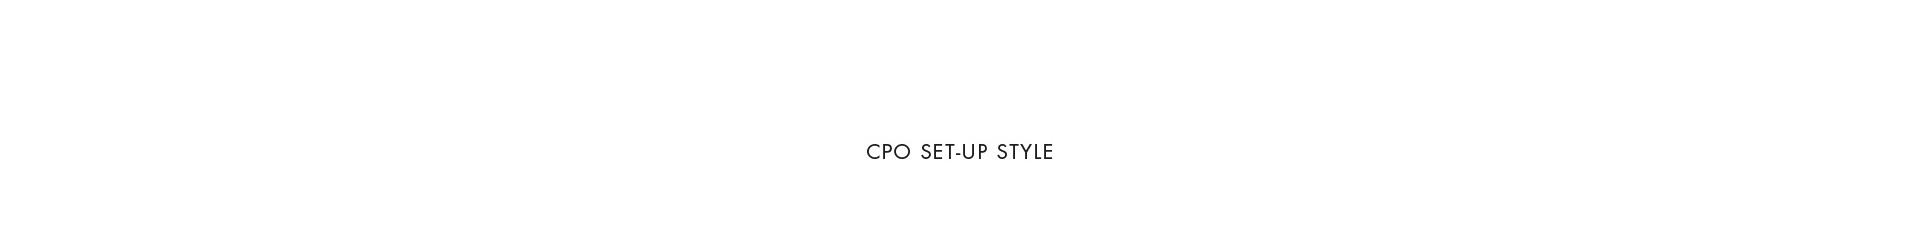 CPO SET-UP STYLE